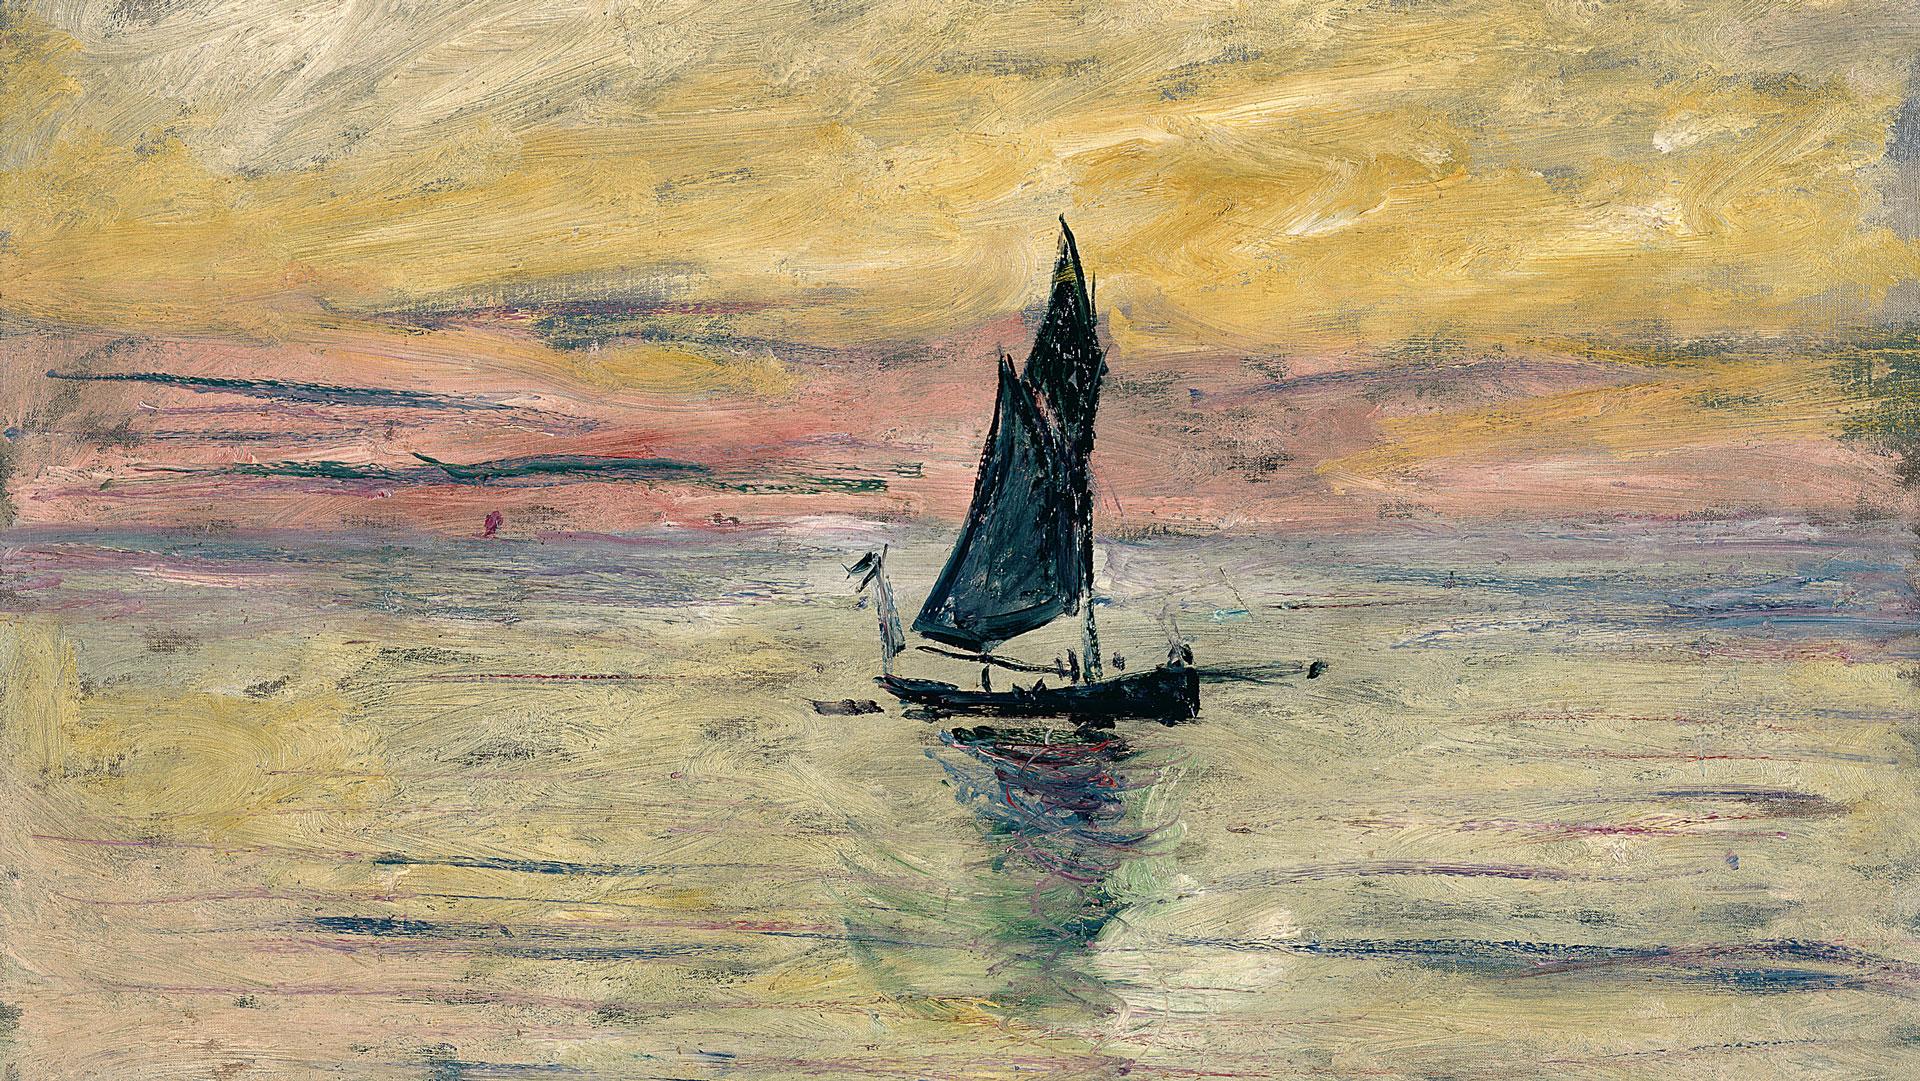 Claude Monet (1840 -1926) Barca a vela. Effetto sera, 1885 Olio su tela, 54x65 cm Parigi